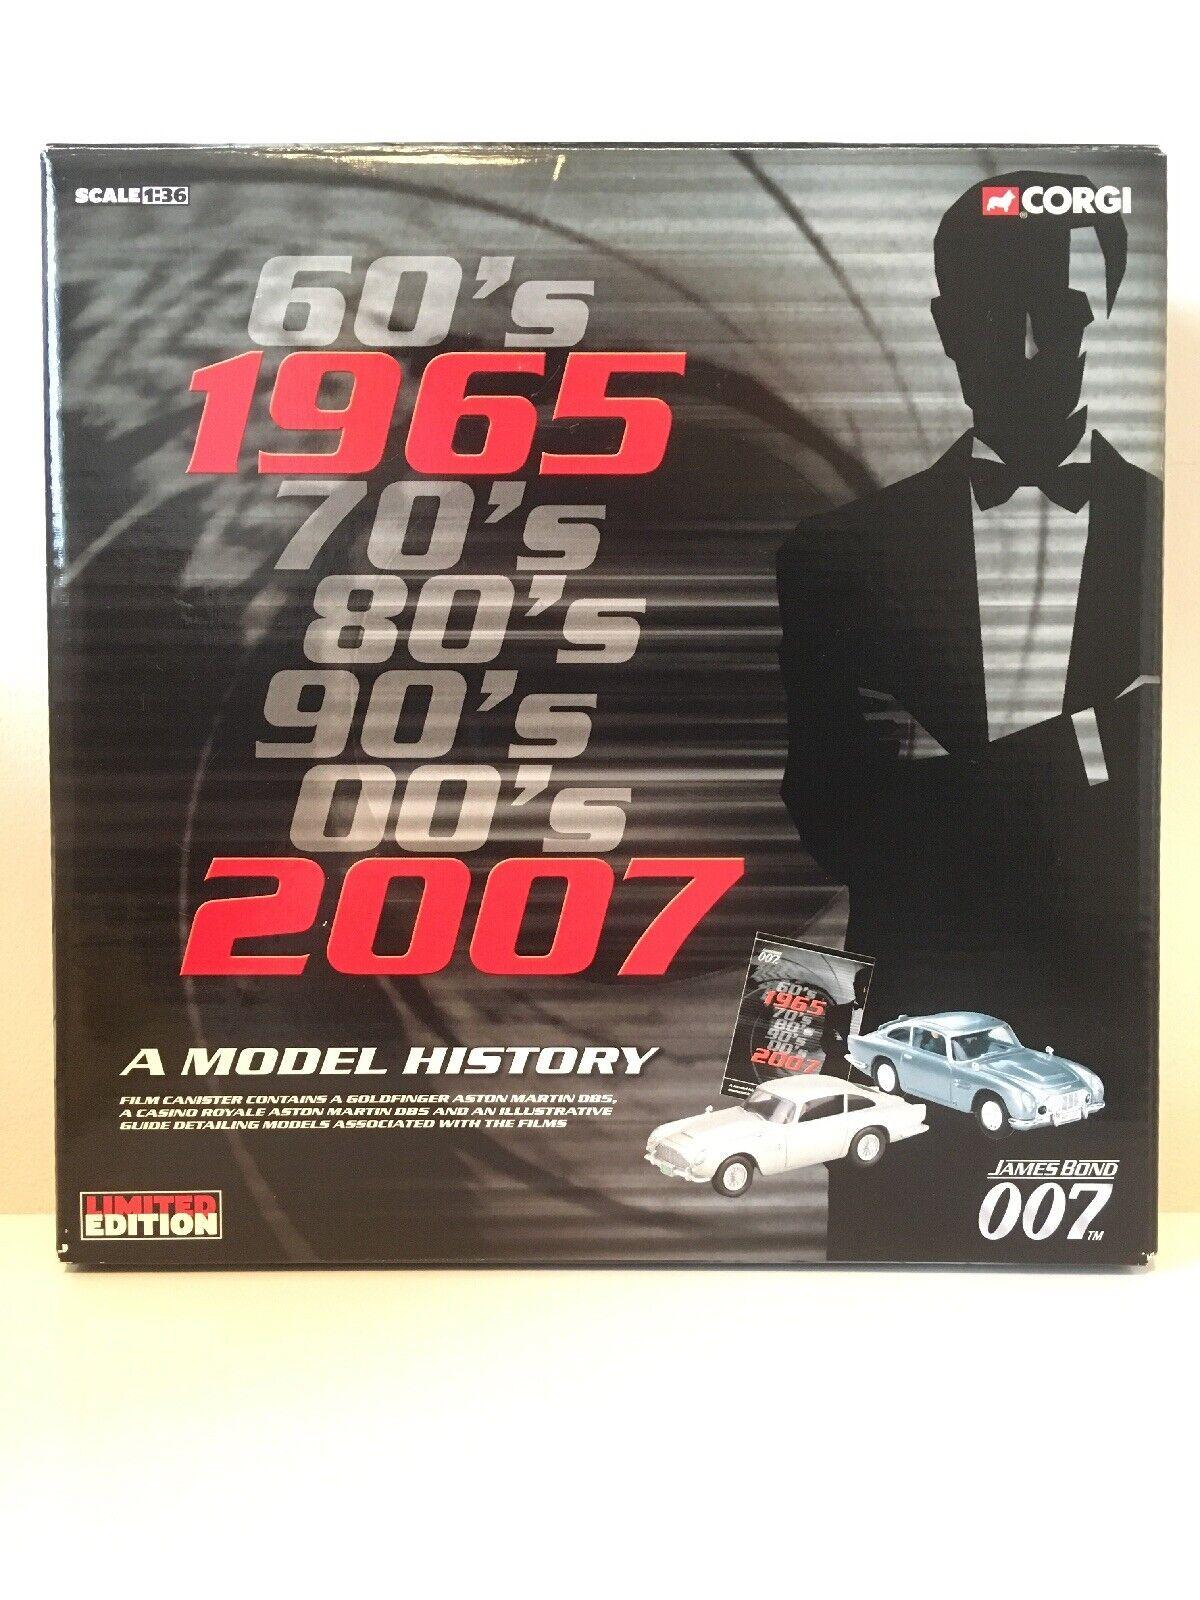 Rare James James James Bond Corgi 93989 ,Limited Edition ,Film Cannister DB5 Die Cast Set 00a663